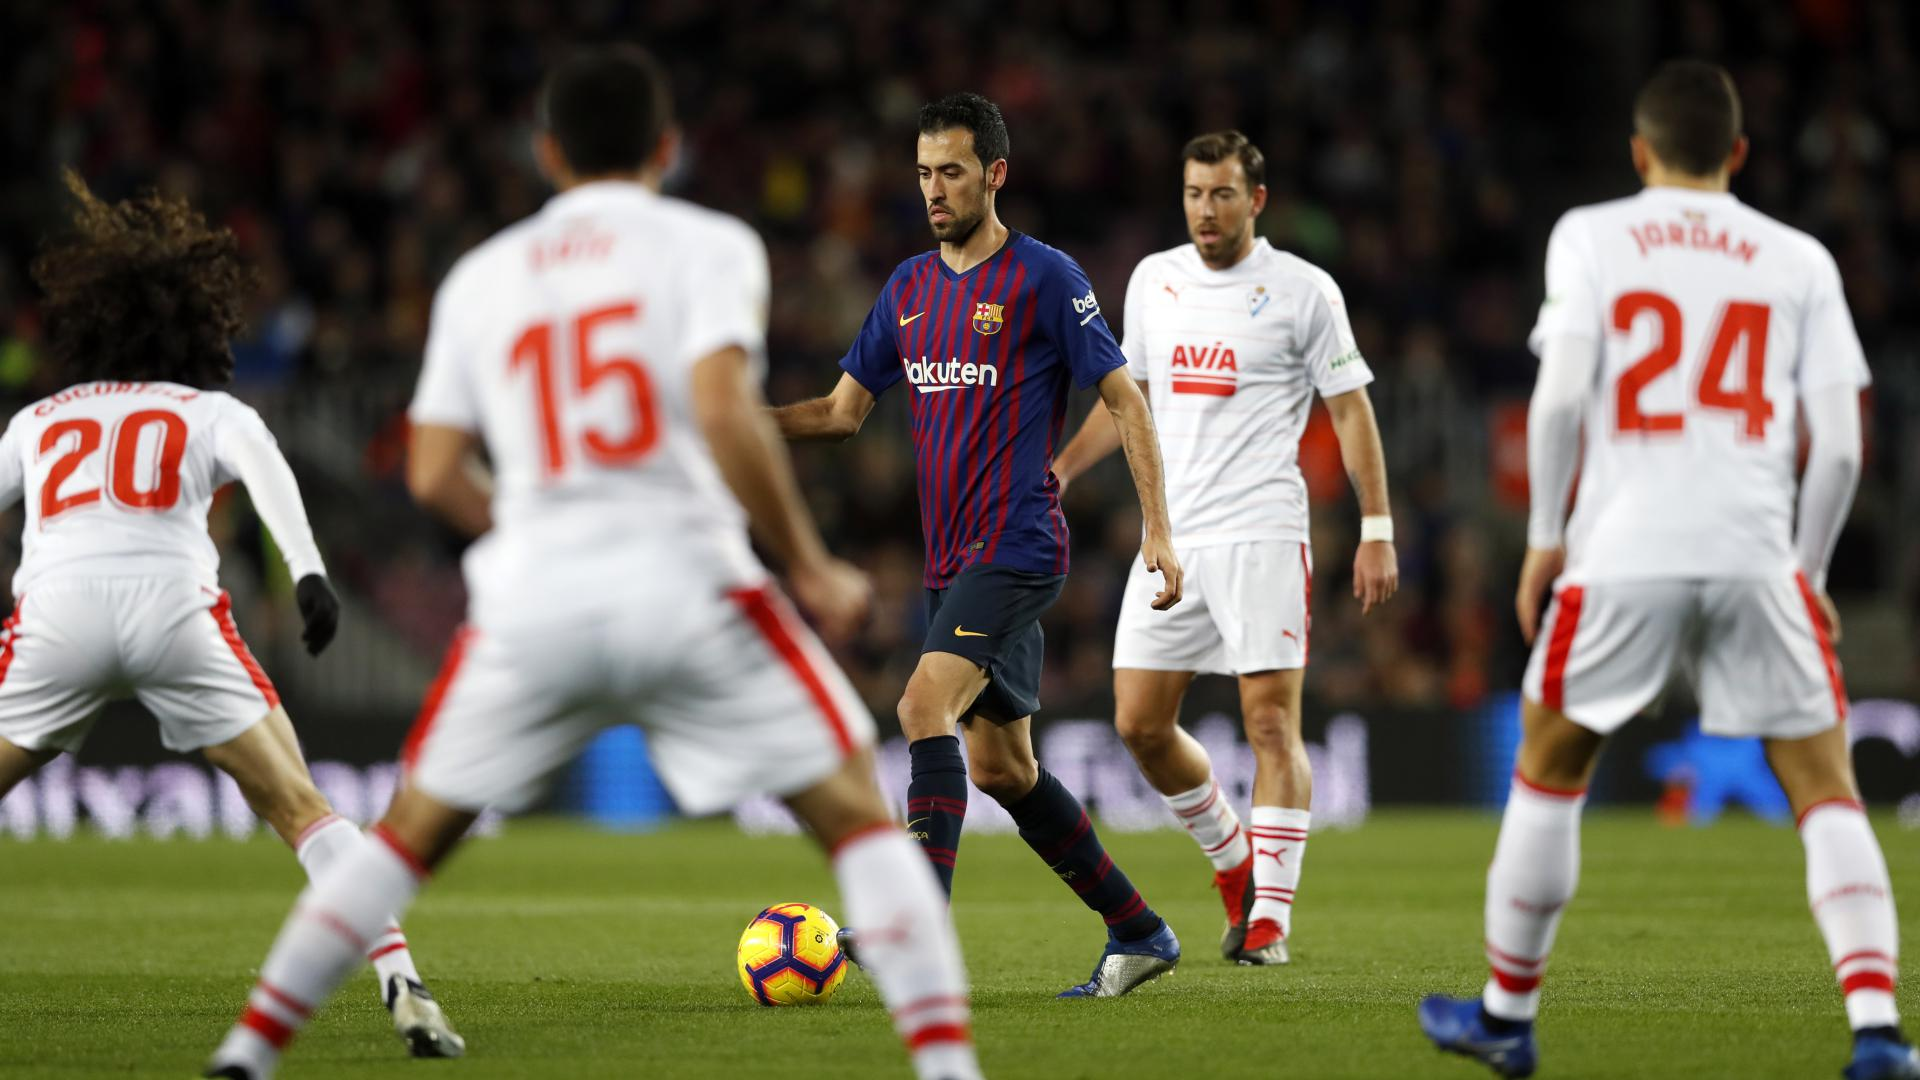 New time set for Eibar vs Barça